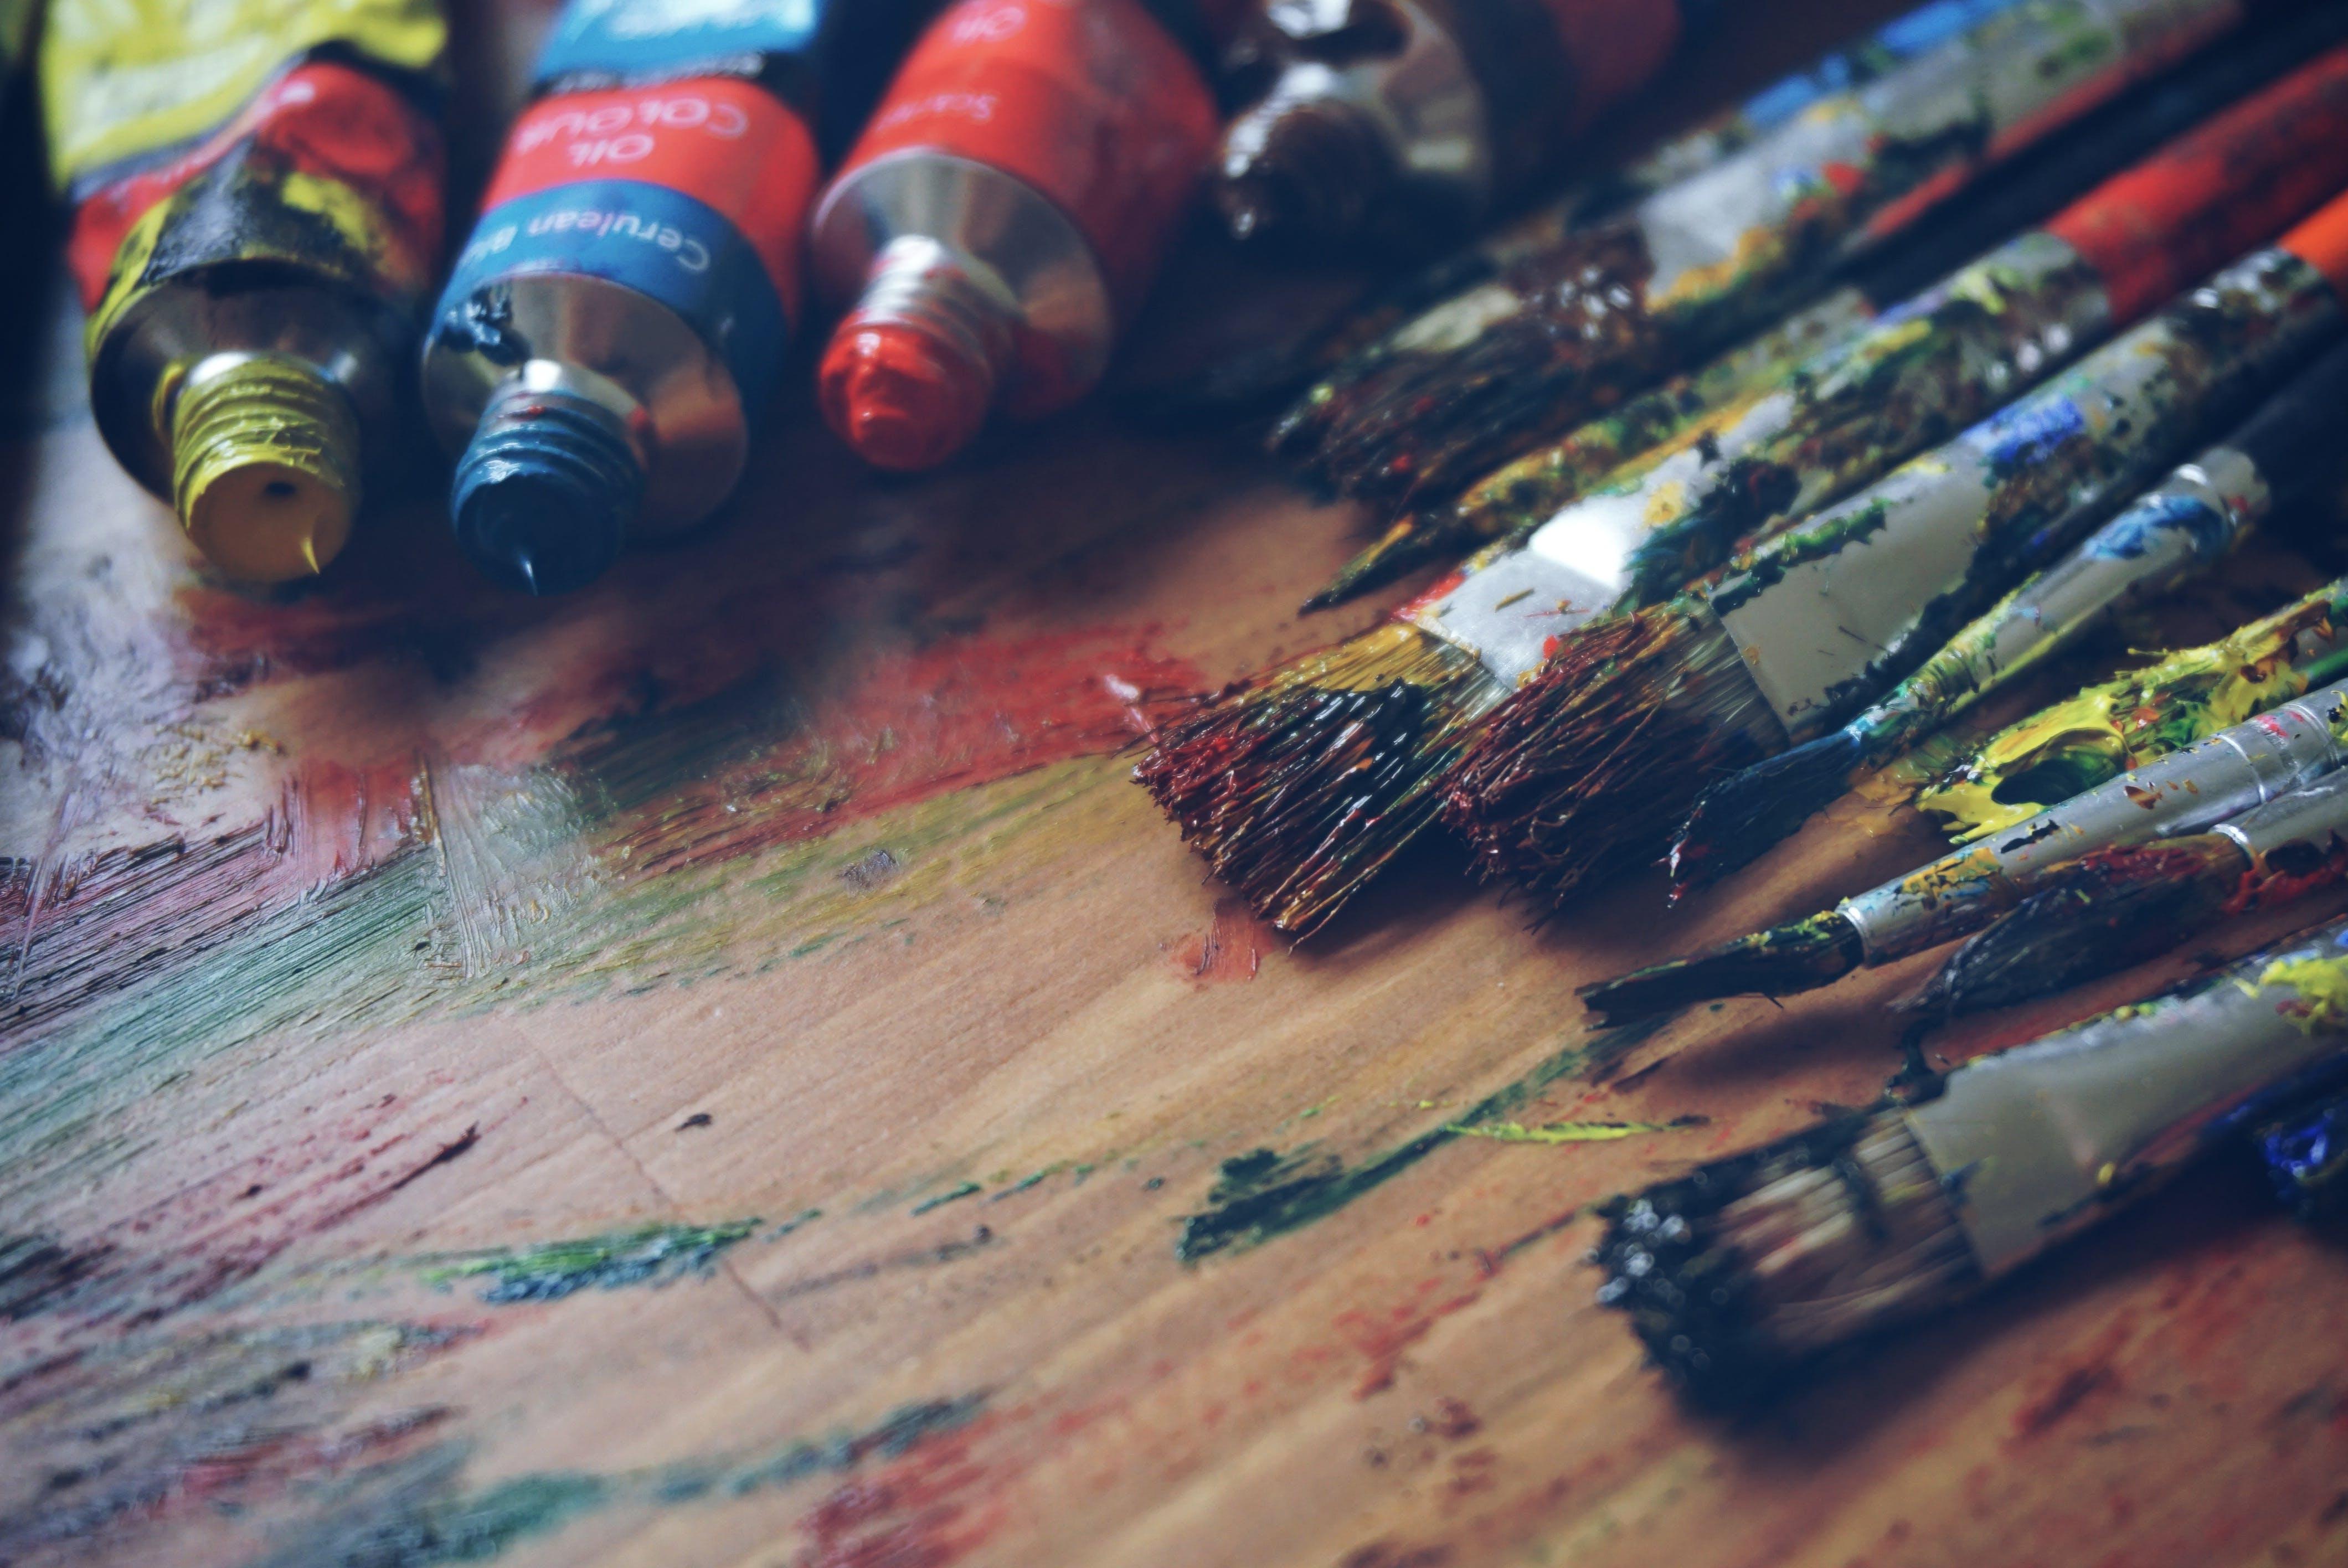 Paintbrushes Acrylic Paints on Wooden Surface